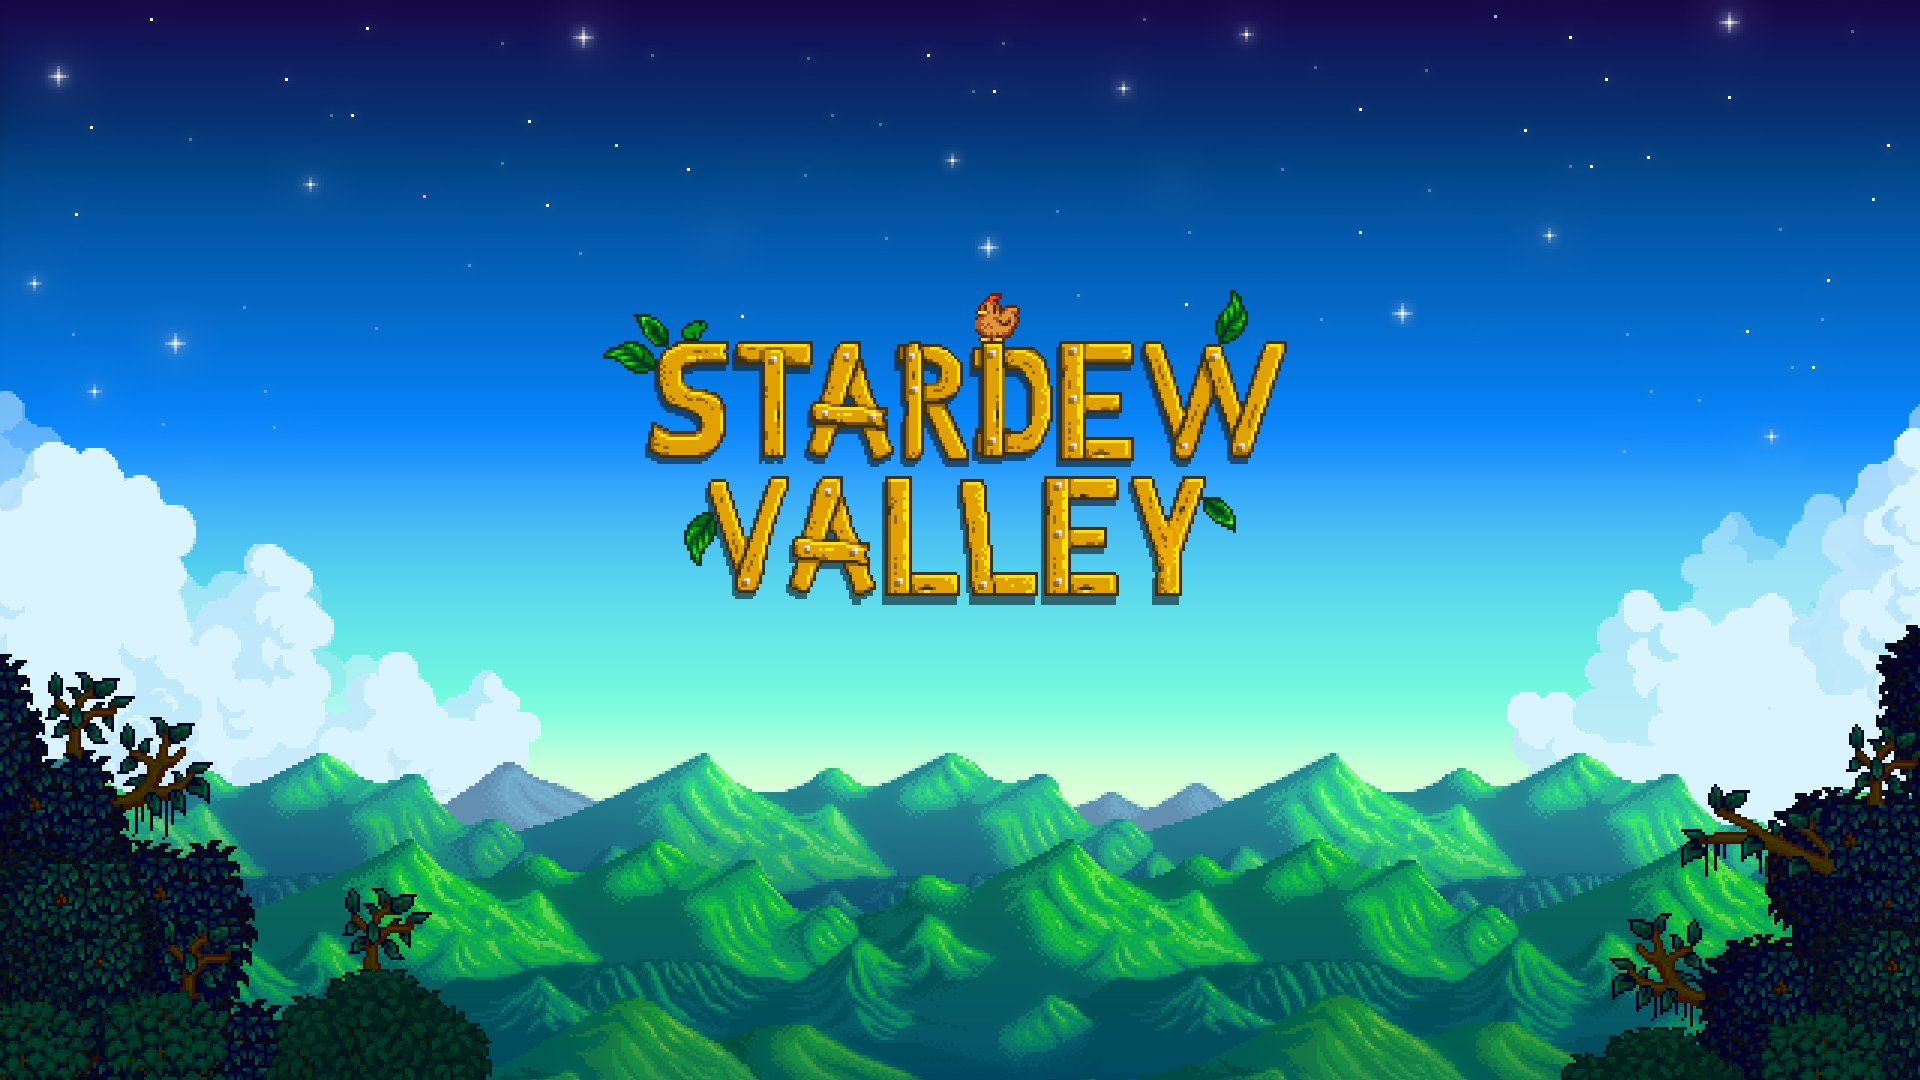 Stardew Valleyが3/14日にGoogle Plya Storeに登場か